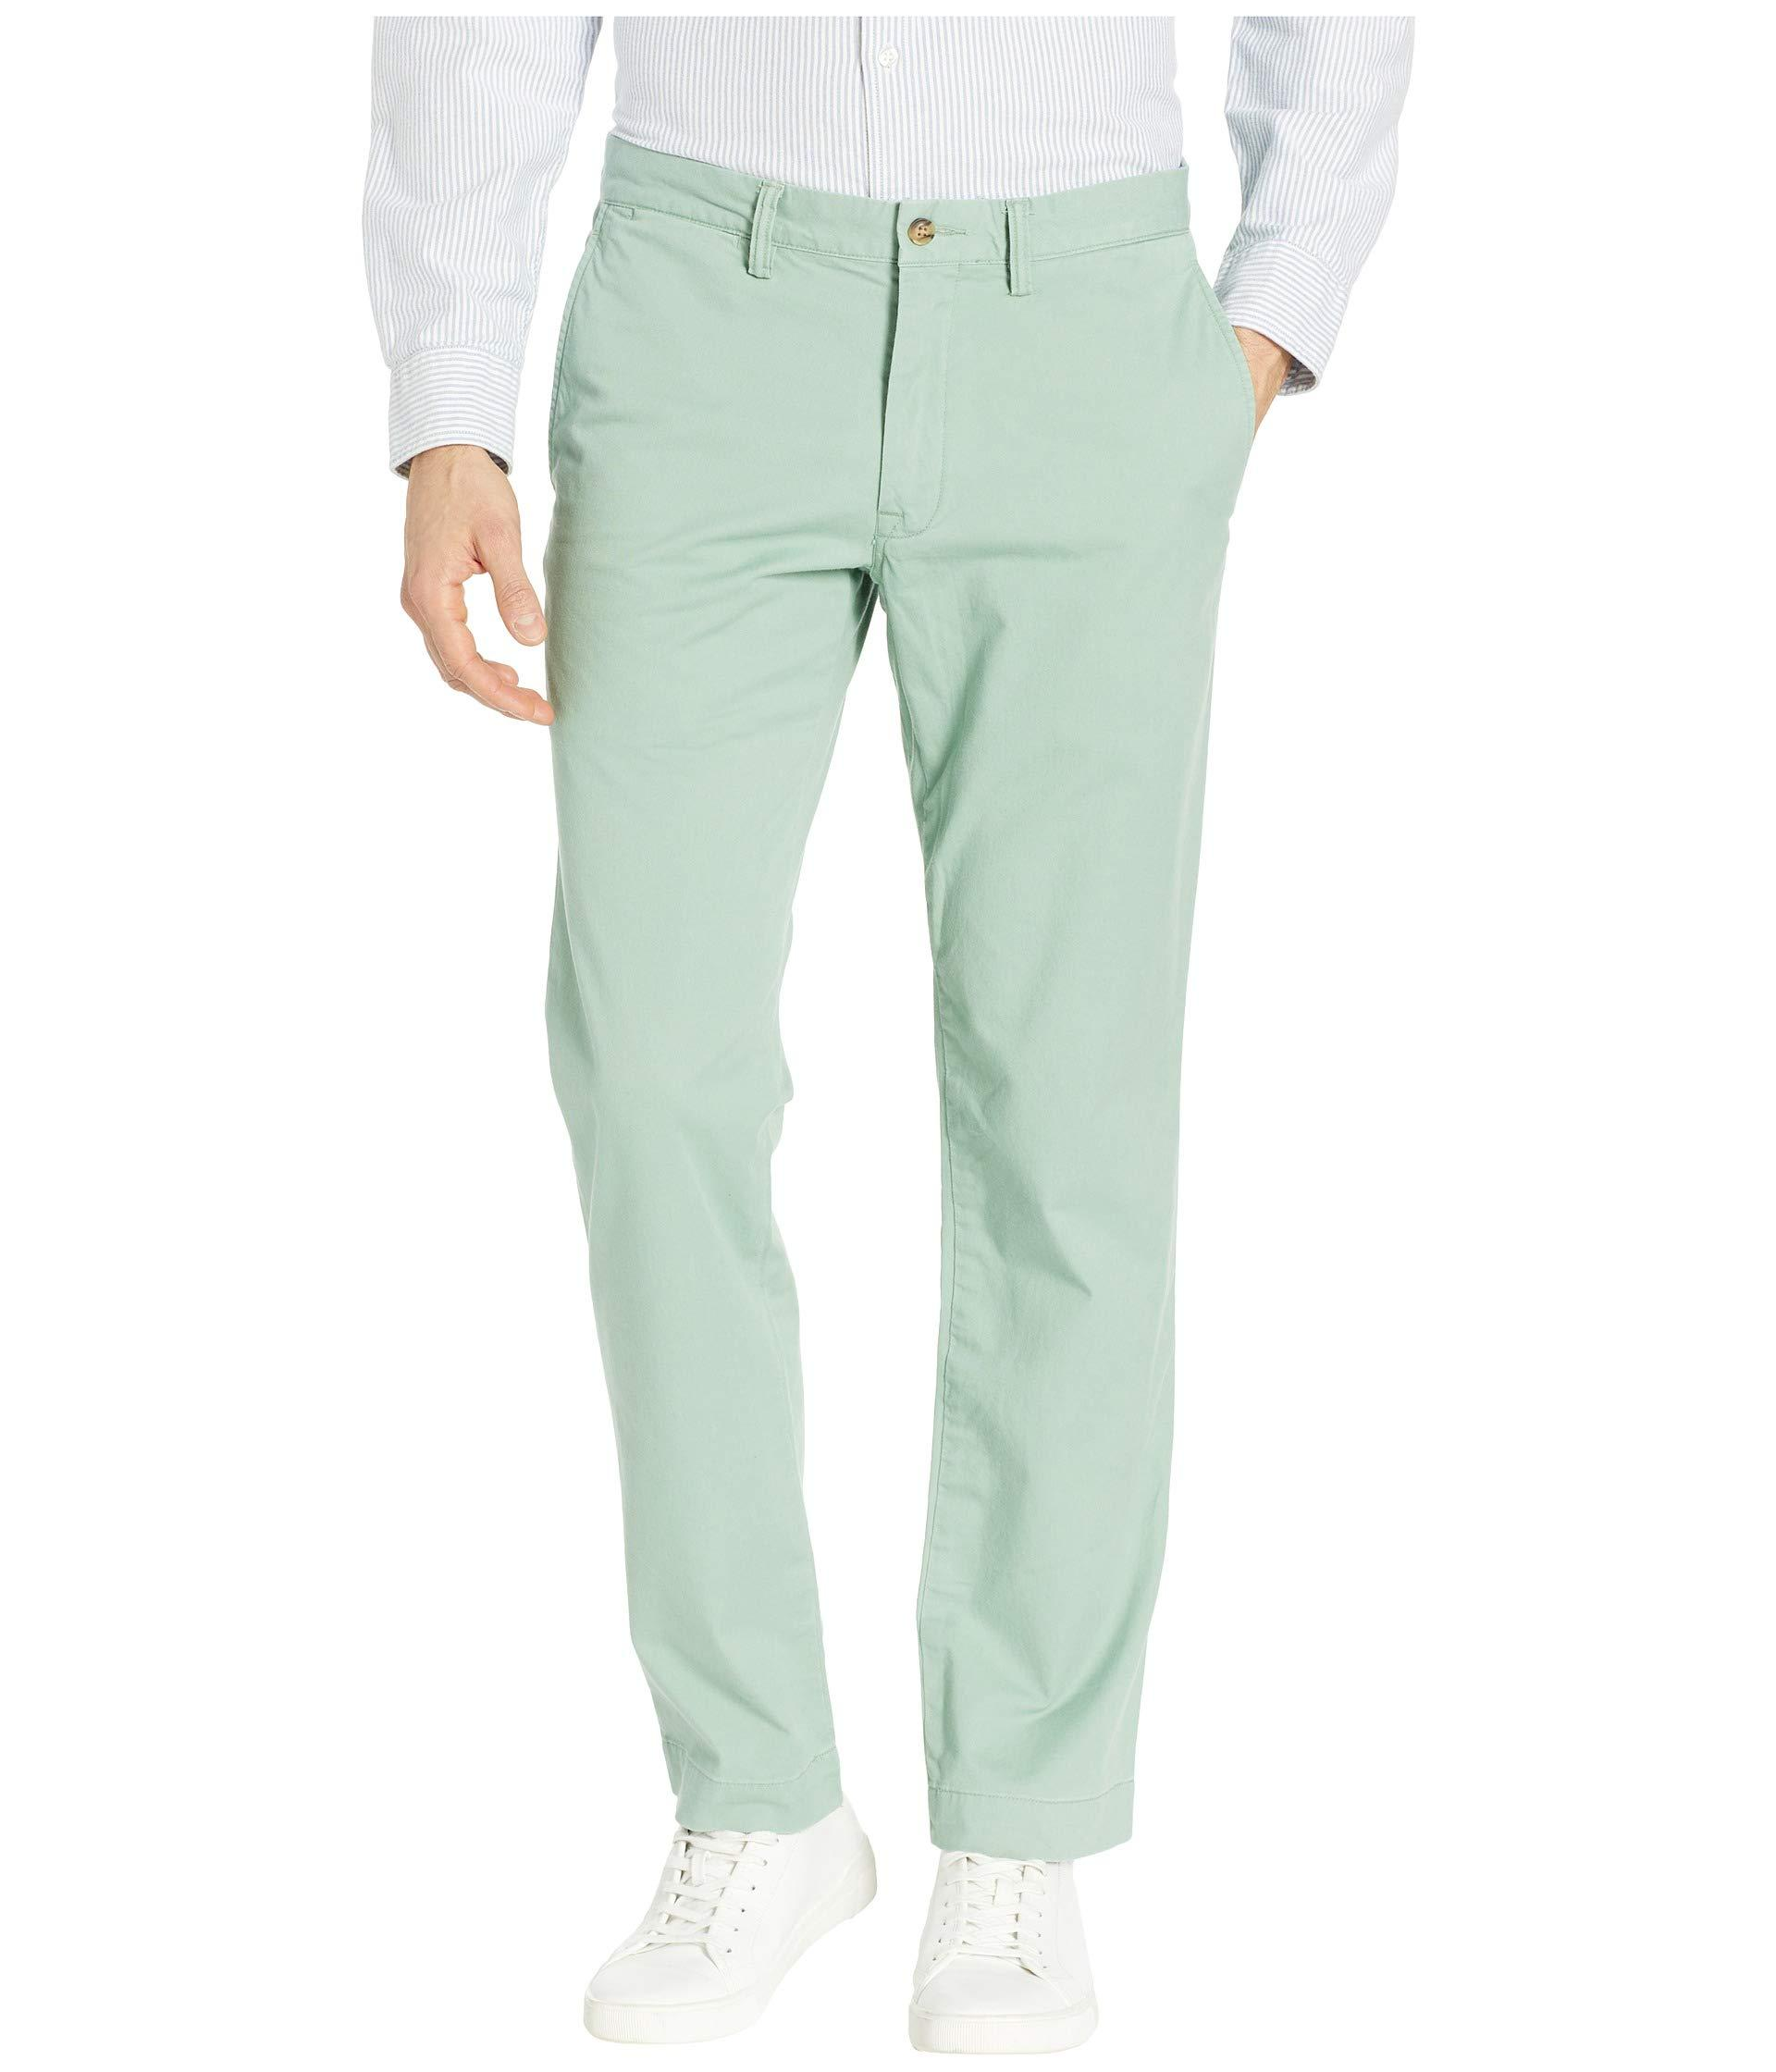 Casual Pants Mens Ralph Polo HerenKleding Lauren UqSMVzGp